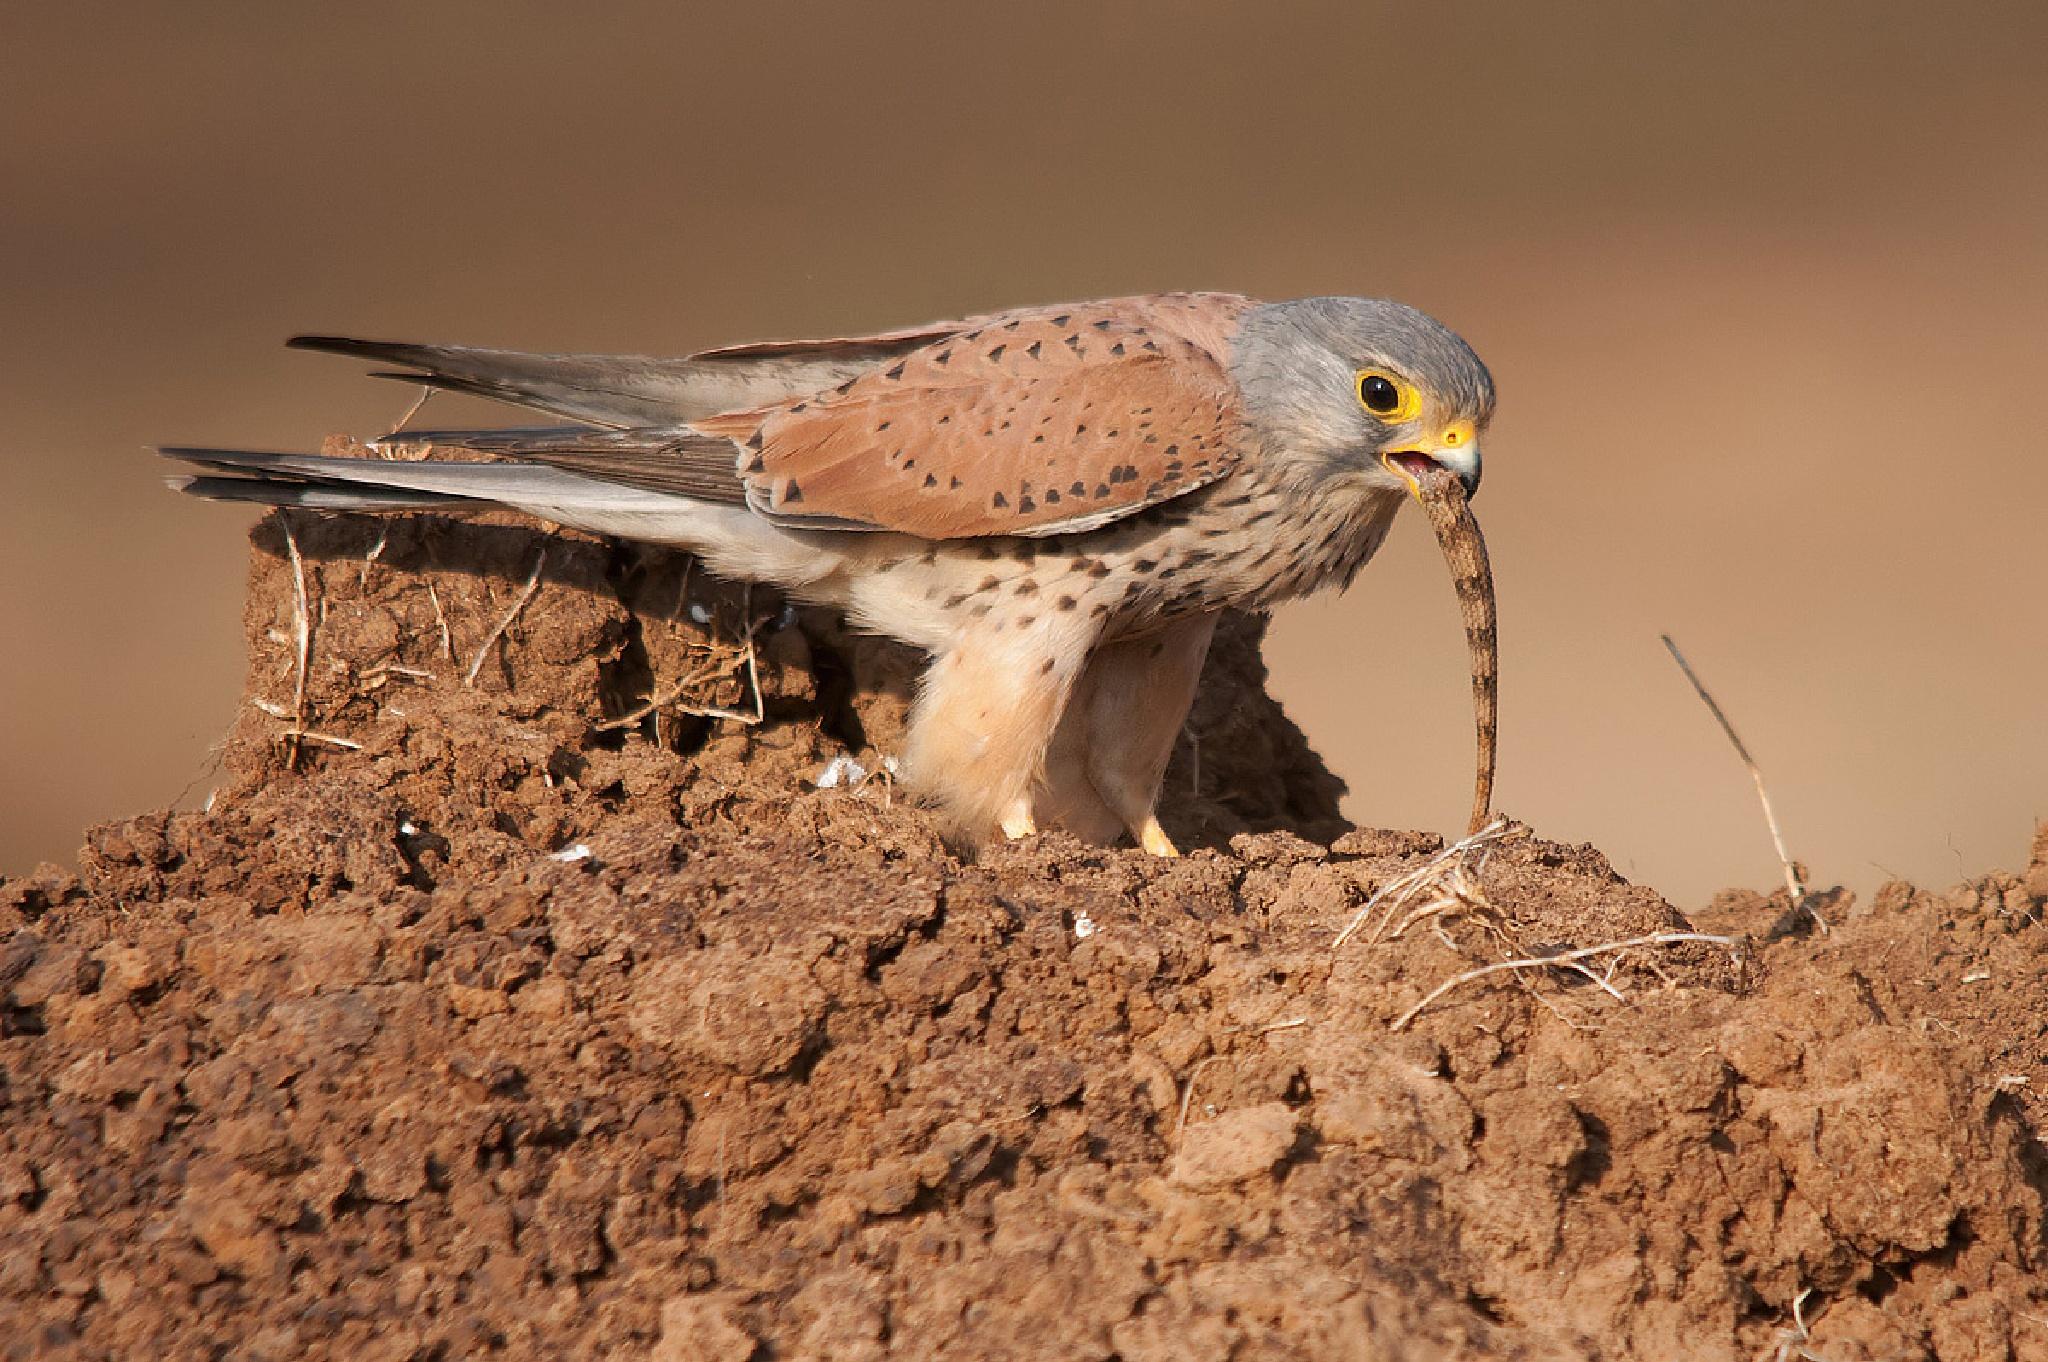 Common Kestrel - Male by GirishPrahalad